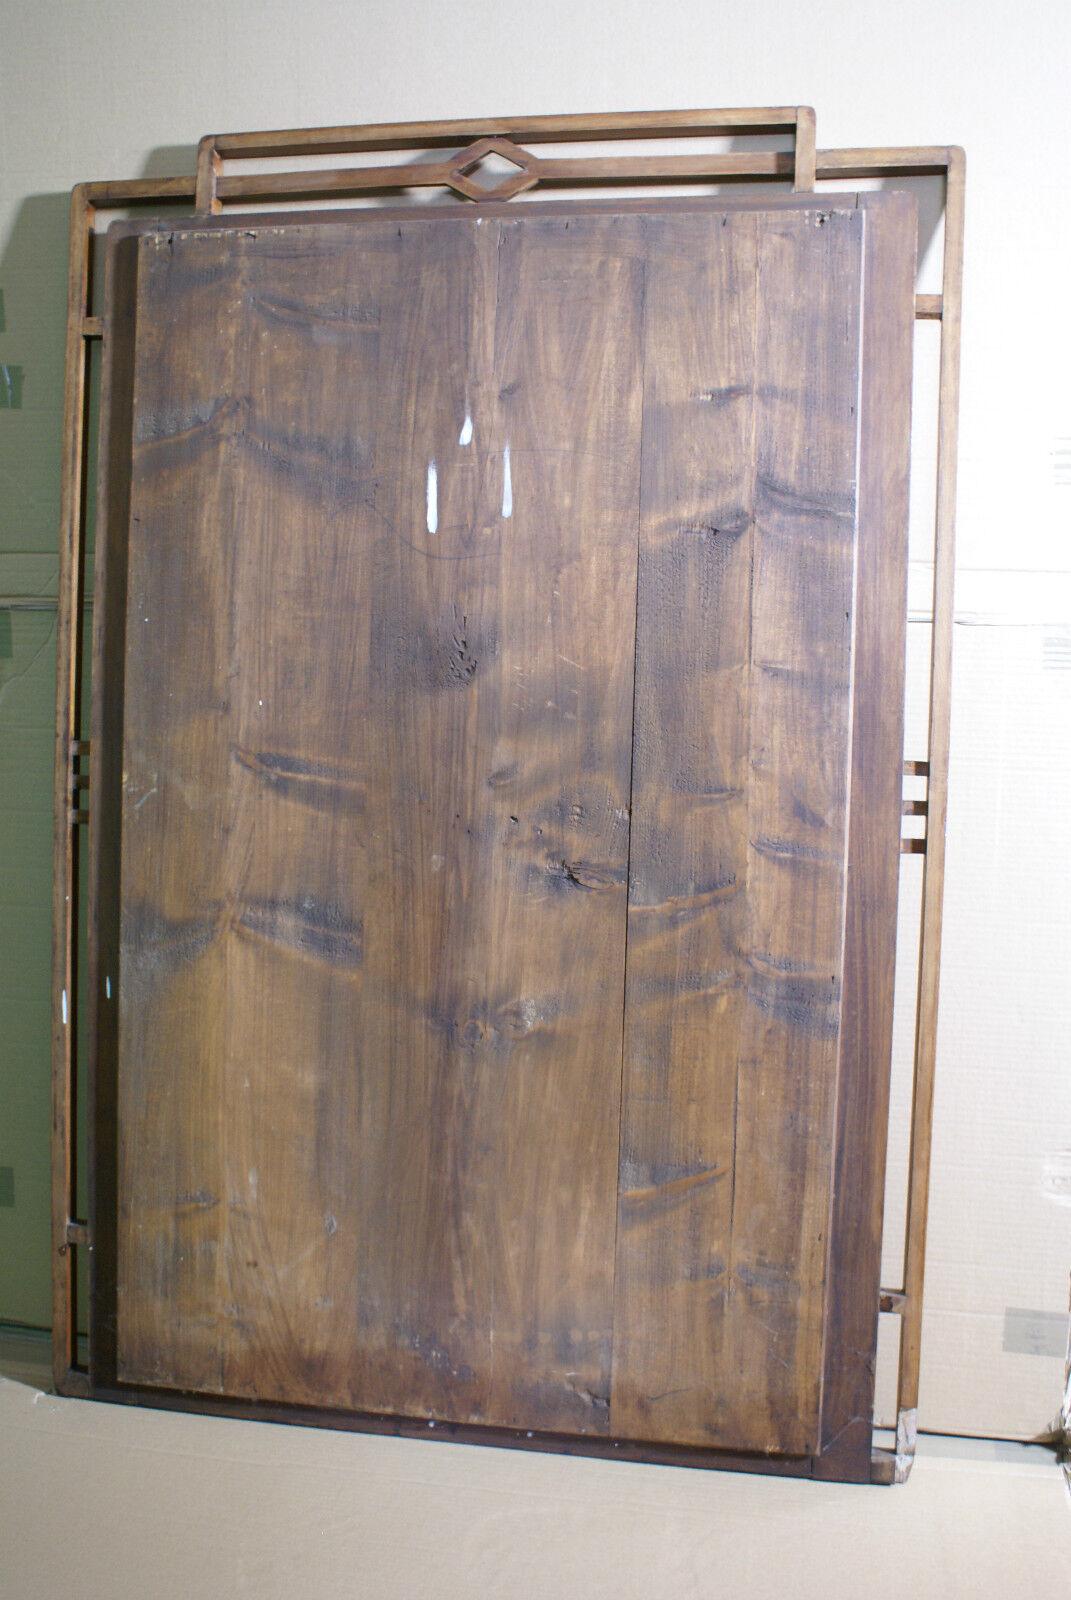 antiker spiegel mit facettenschliff und holzrahmen um 1910 nu baum eur 465 00 picclick de. Black Bedroom Furniture Sets. Home Design Ideas